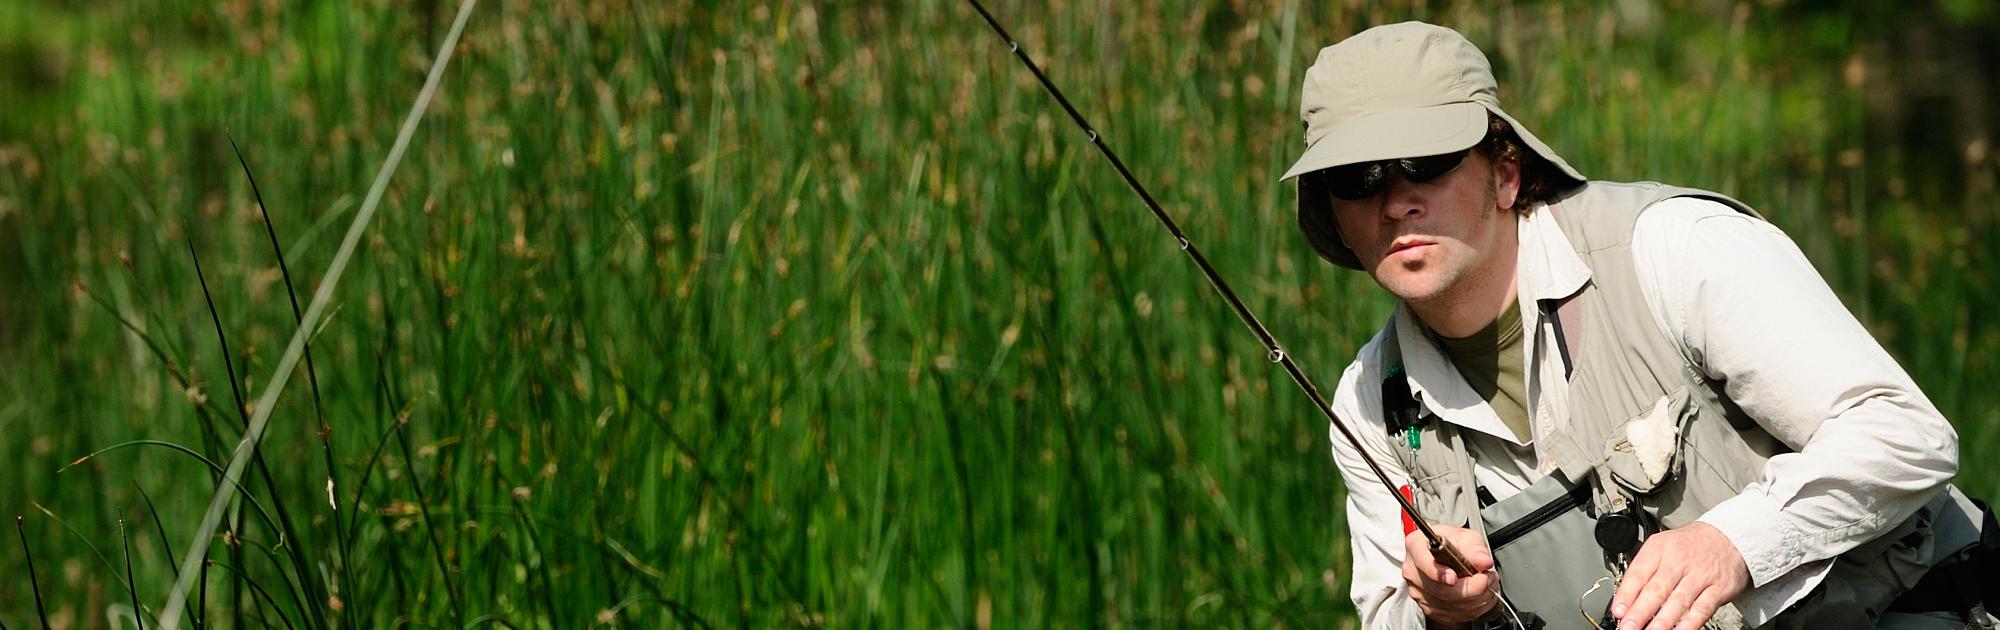 Man fly fishing wearing sunglasses